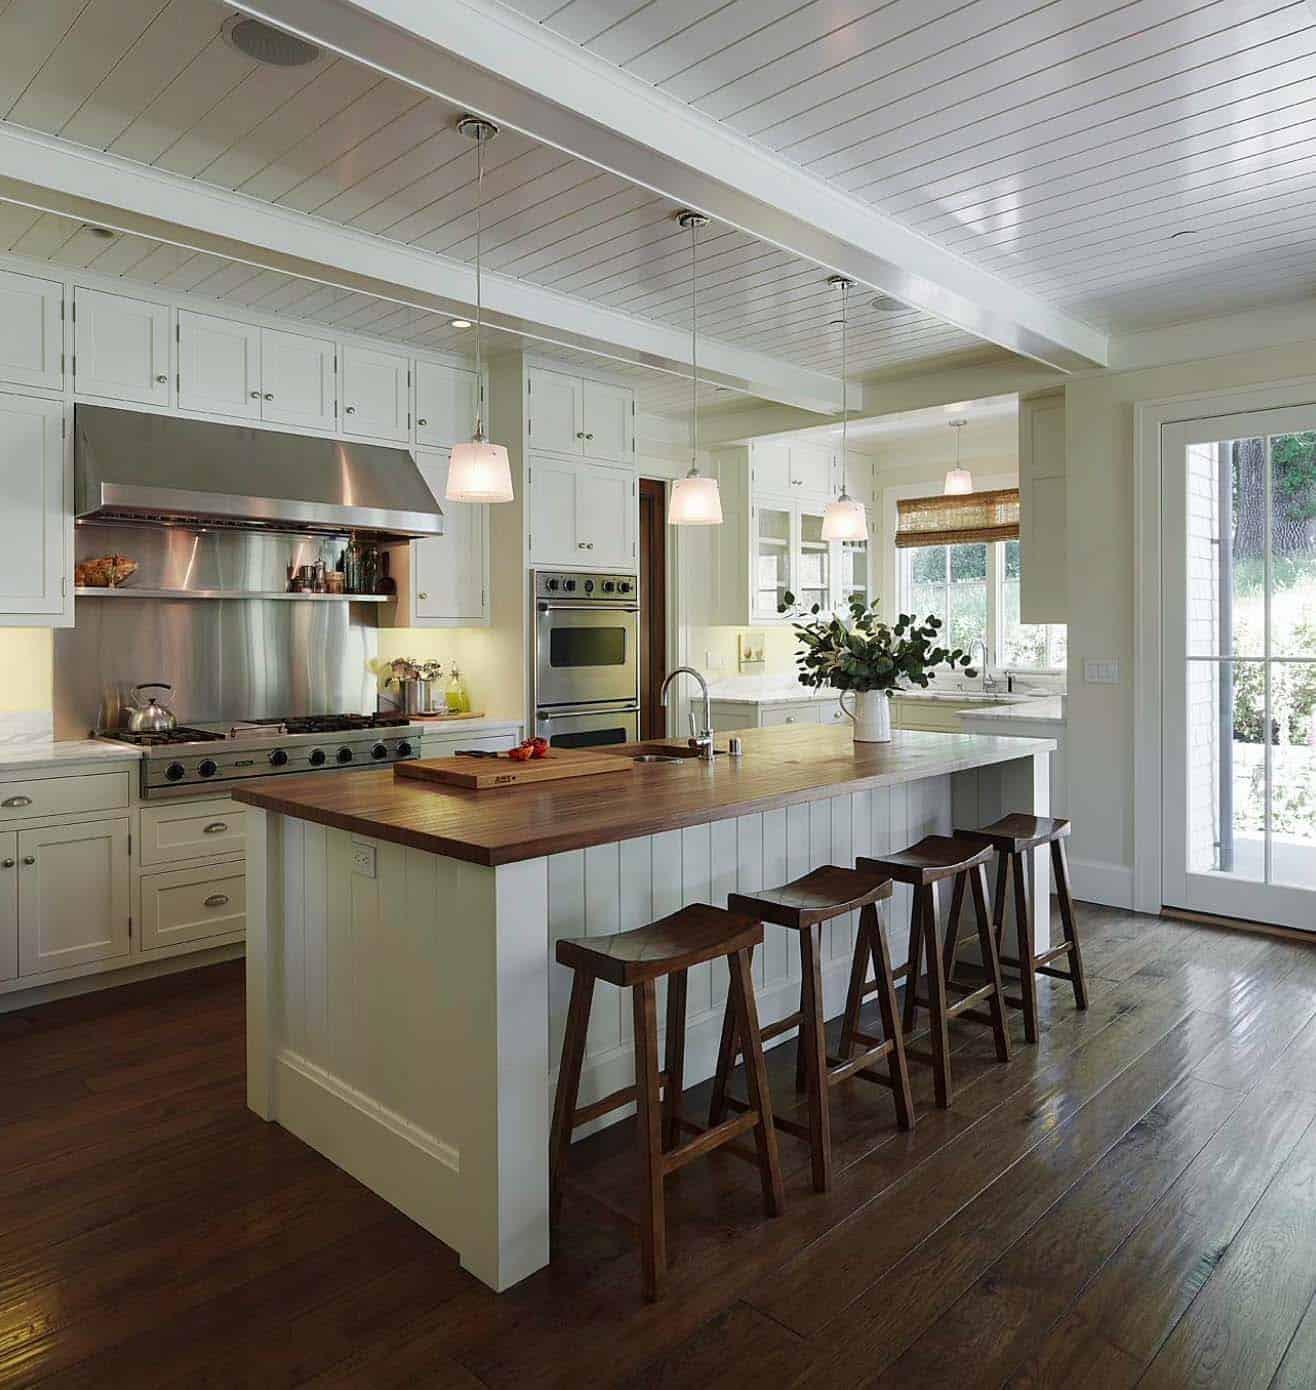 Fullsize Of Island For Kitchen Ideas